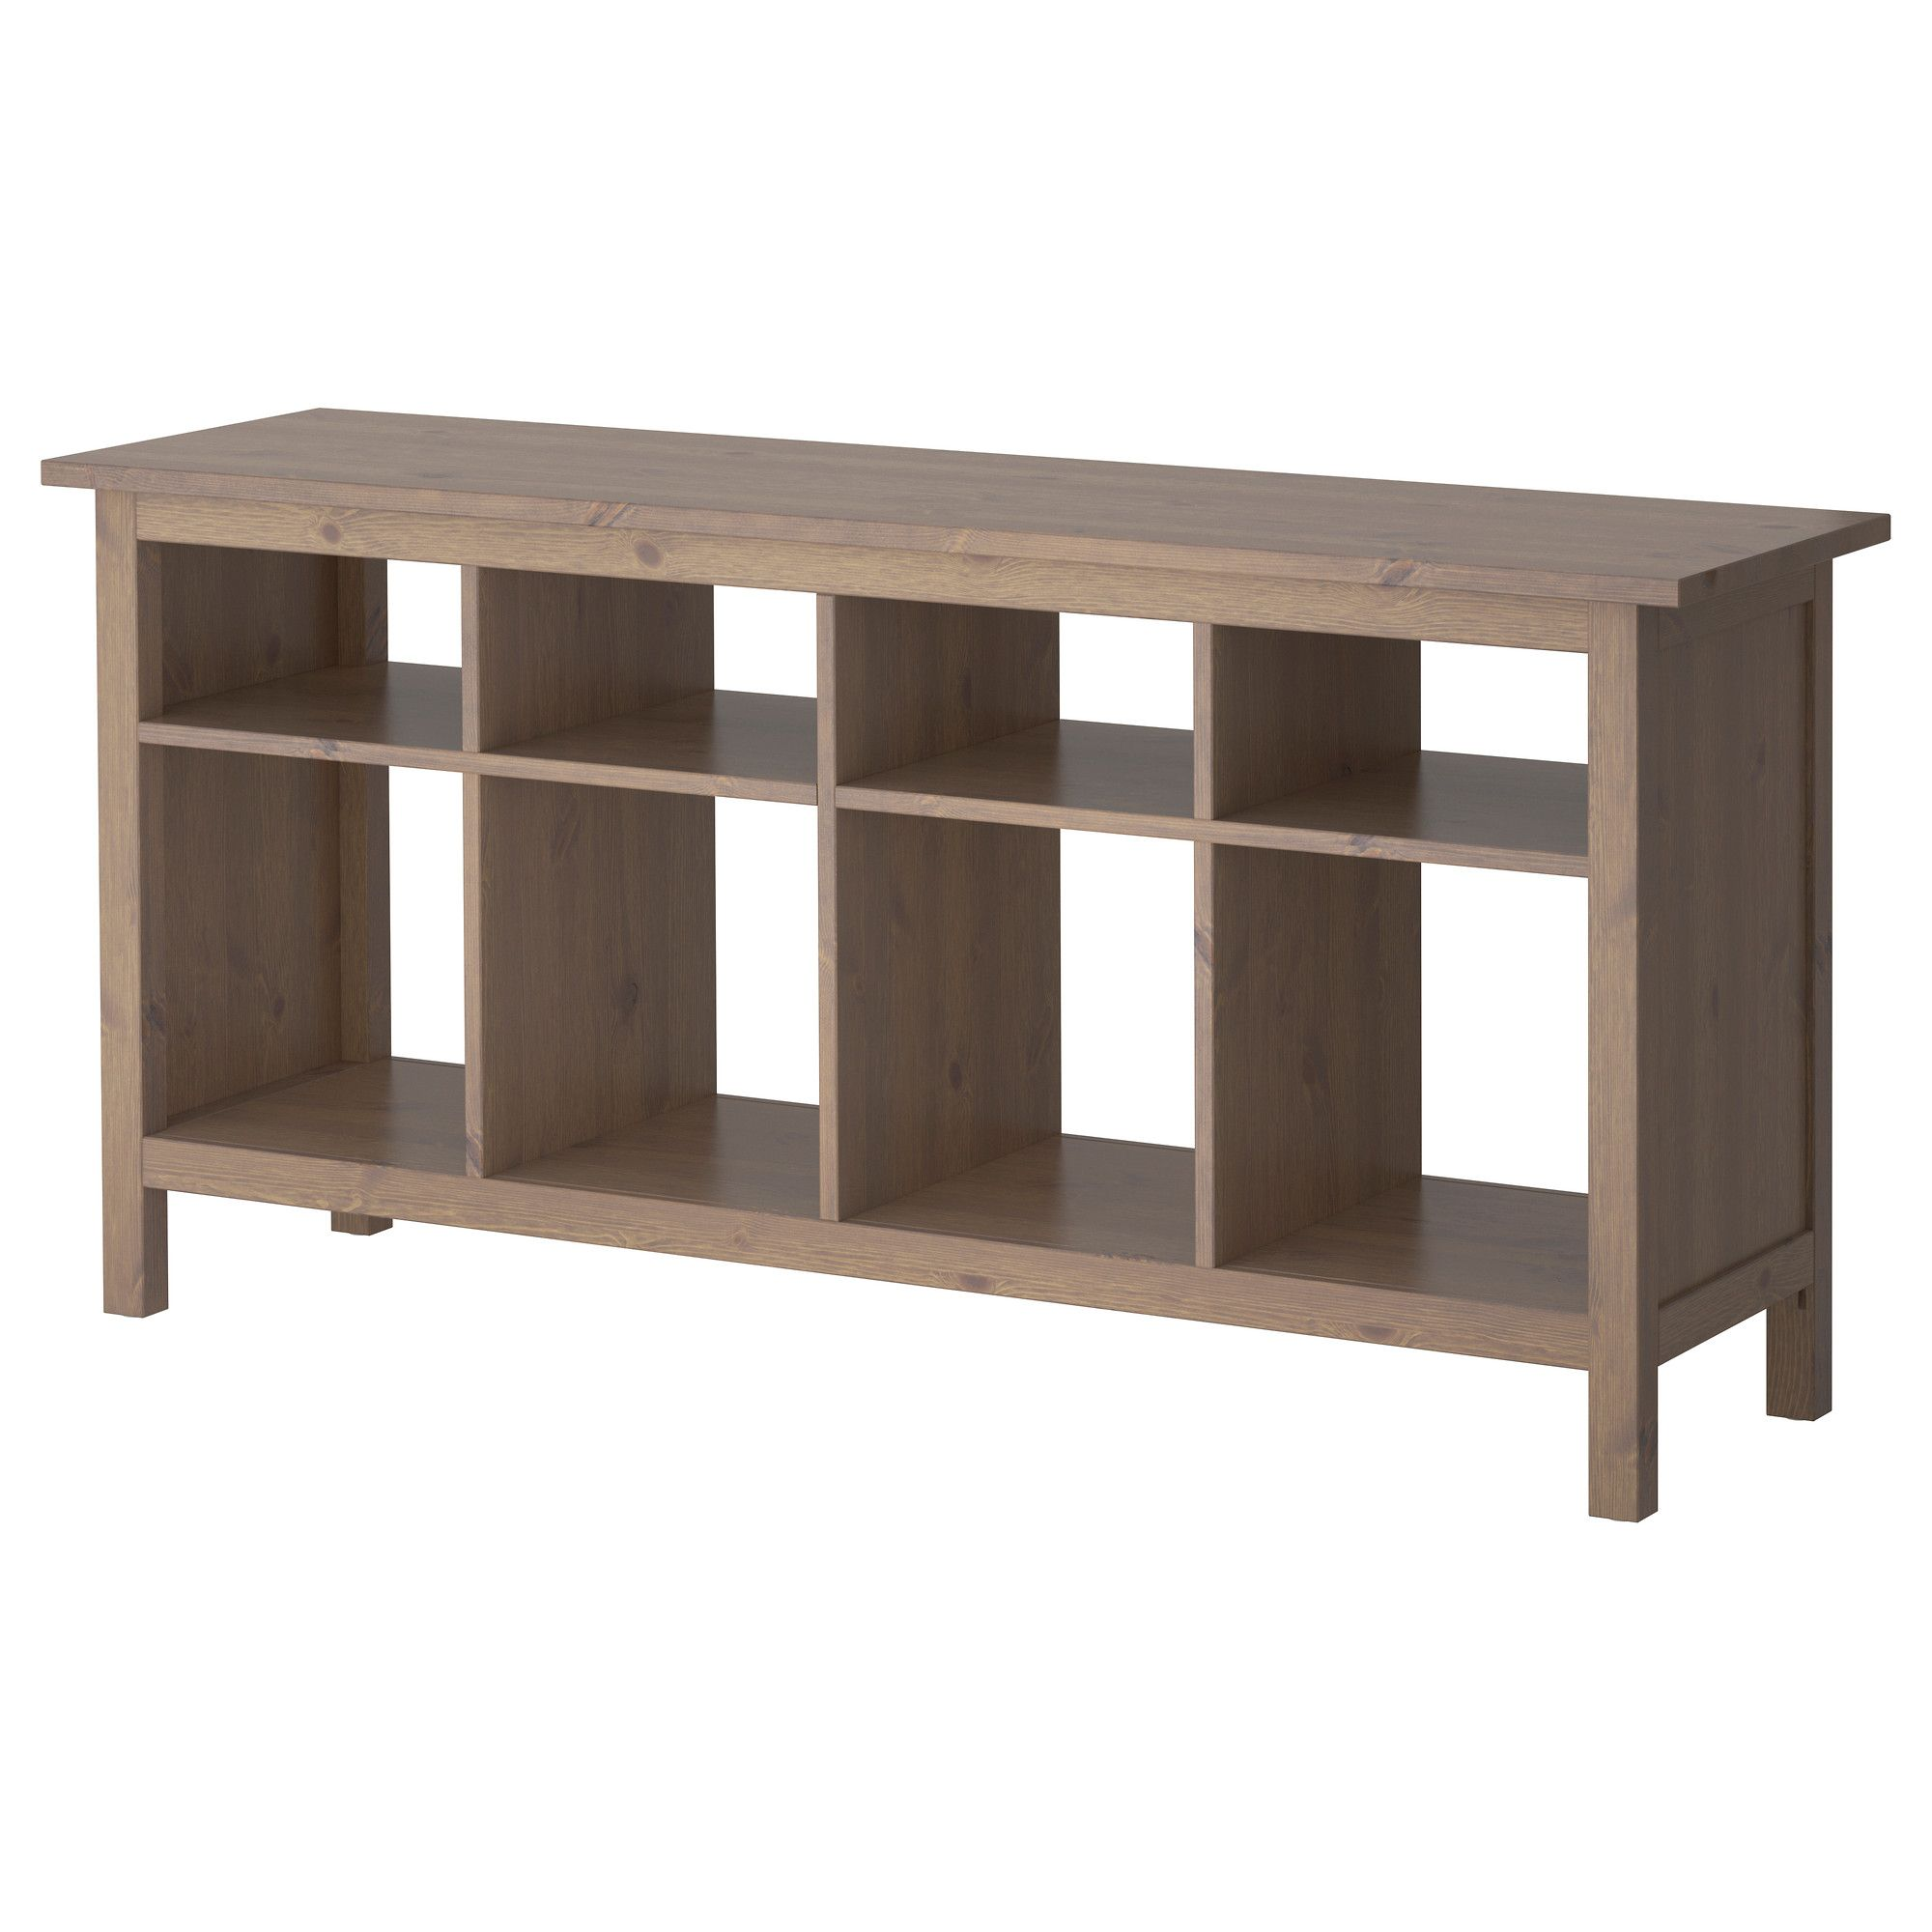 ikea gray brown sofa table hinton wesley barrell hemnes product dimensios